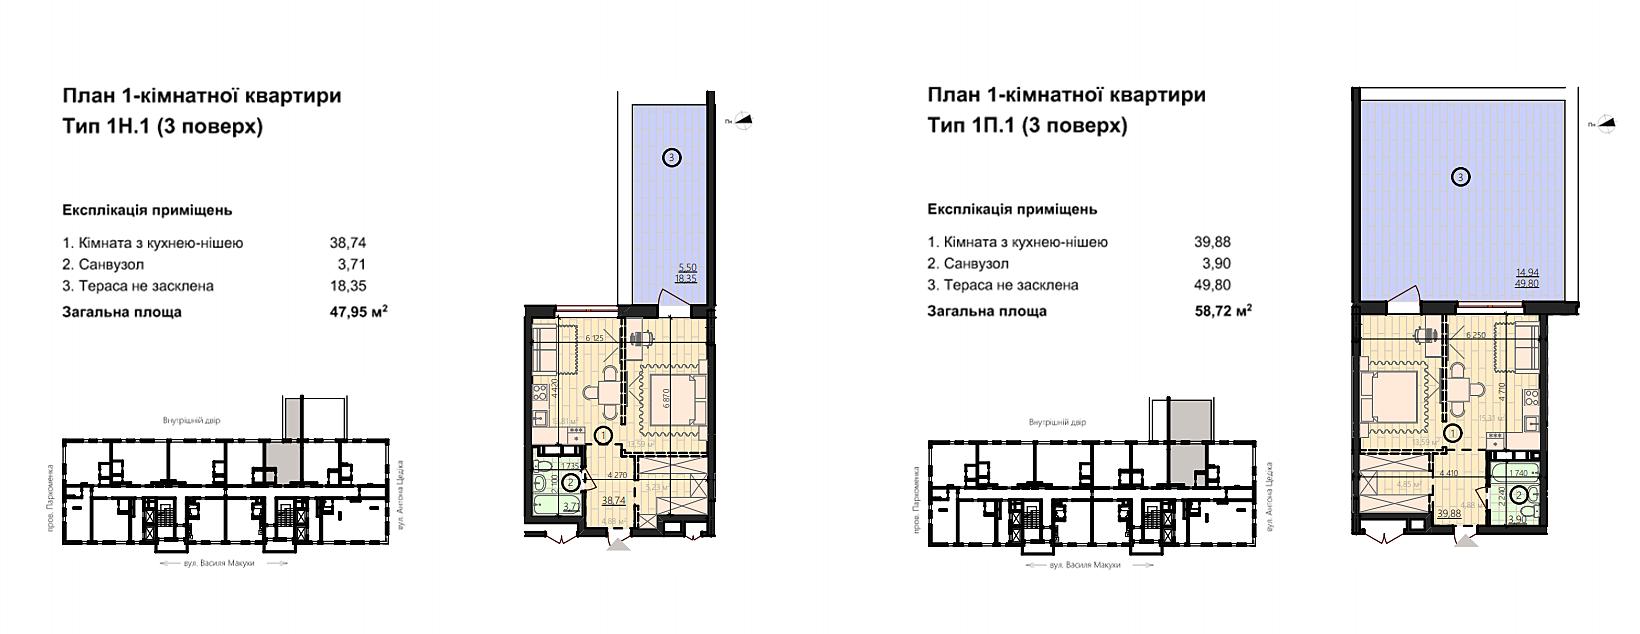 ЖК Урбанист планировки квартир с террасами